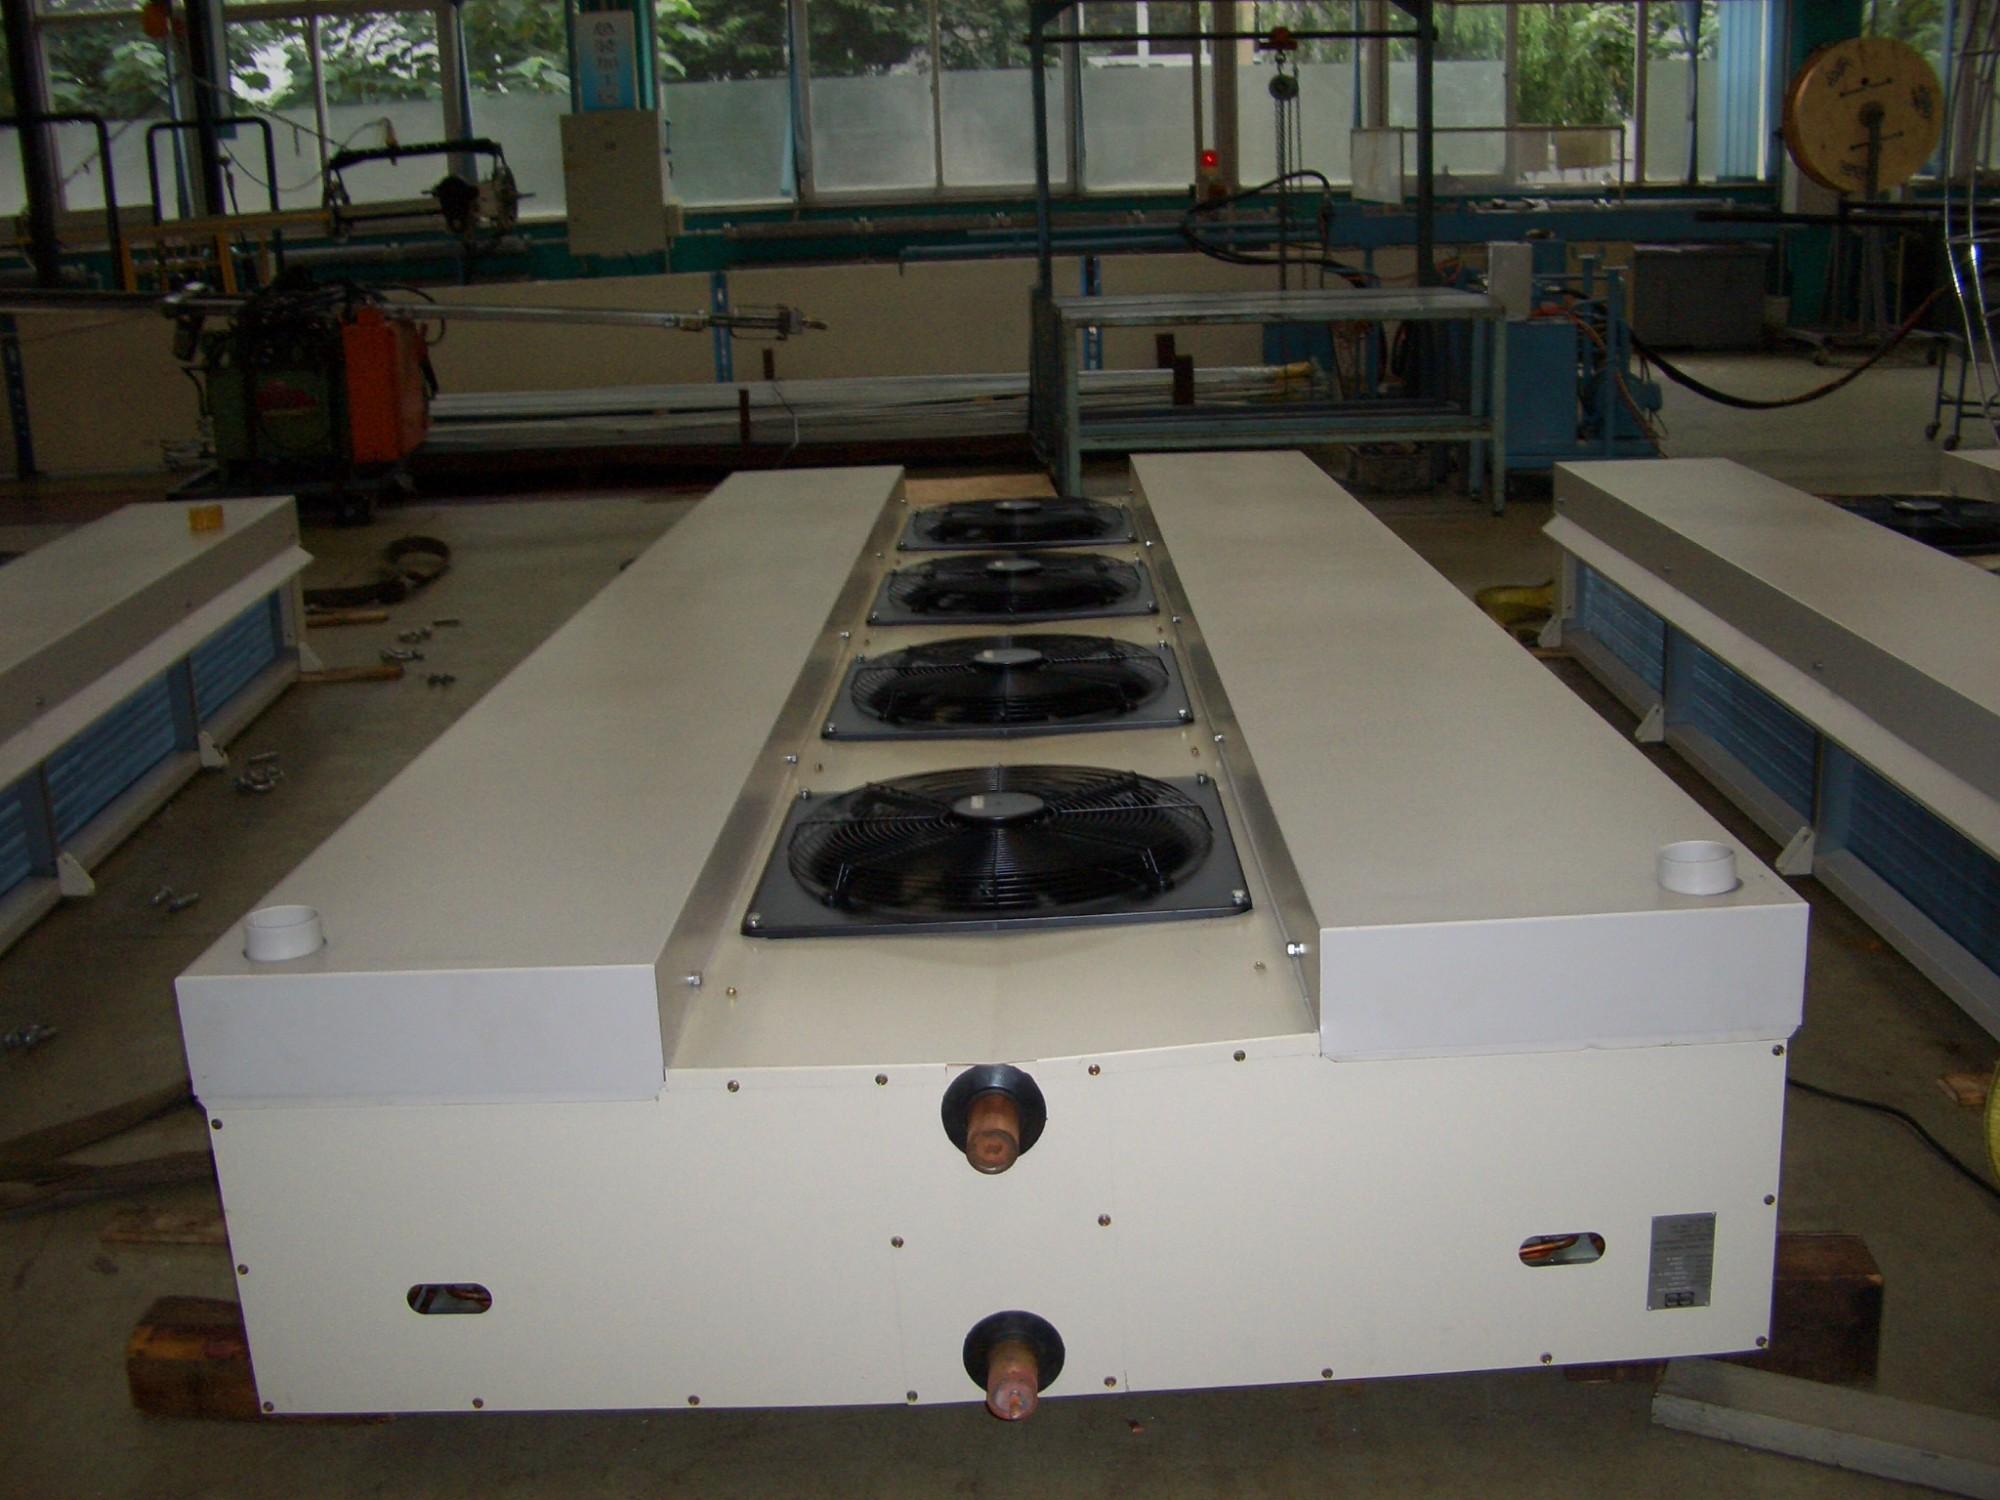 BI-FLOW TYPE AIR COOLER Manufacturers, BI-FLOW TYPE AIR COOLER Factory, Supply BI-FLOW TYPE AIR COOLER